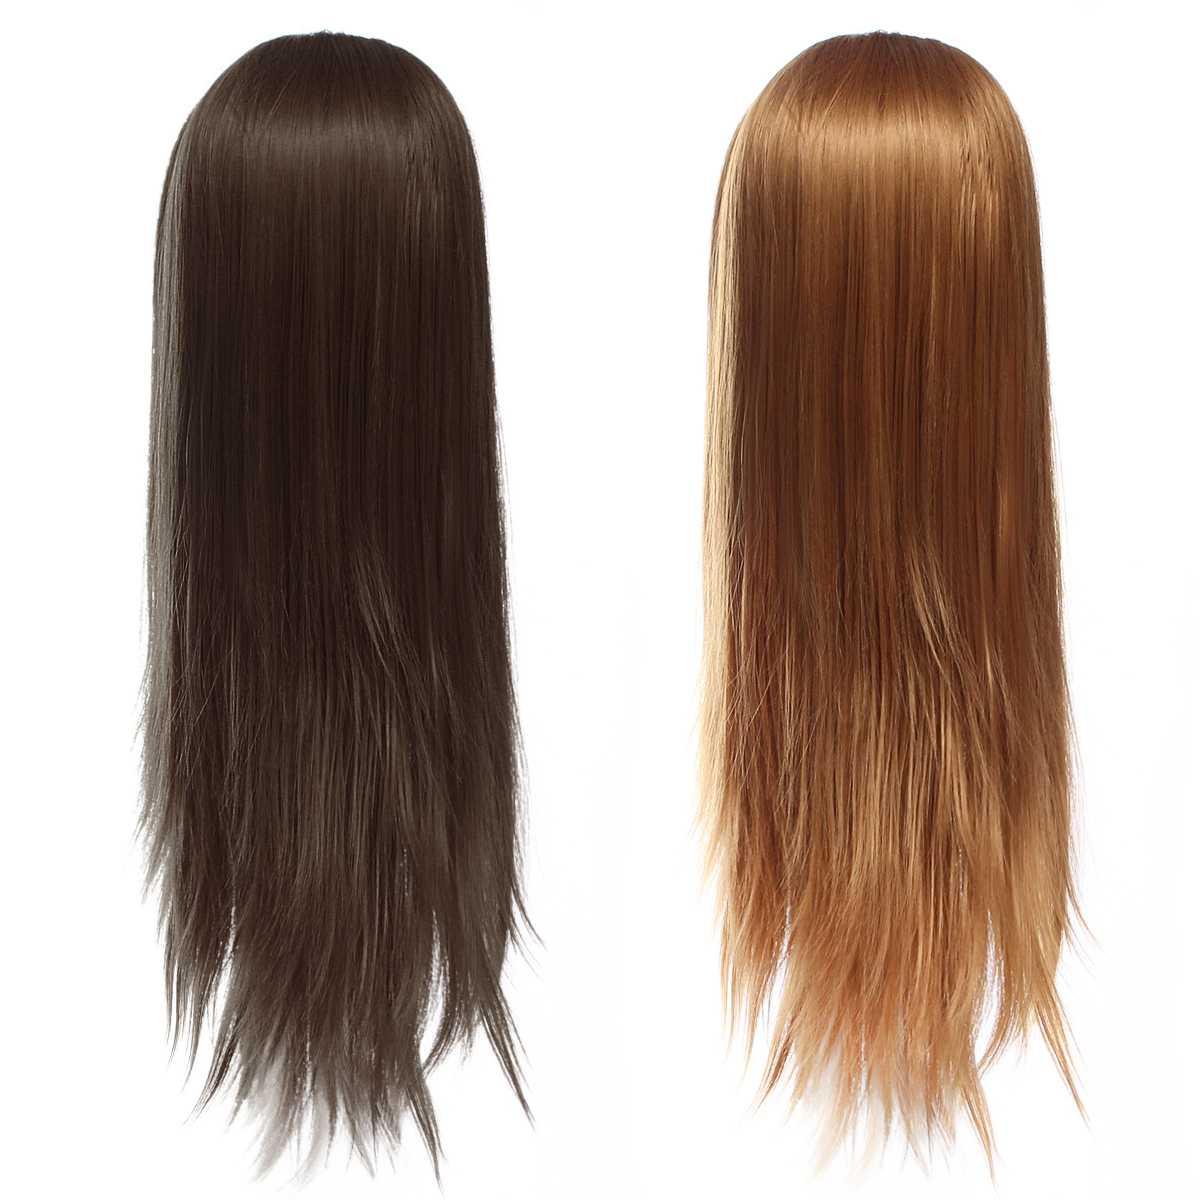 70cm Fiber Hair Hairdressing Training Mannequin Practice Head Salon Professional Hairdresser Styling With Model Bracket